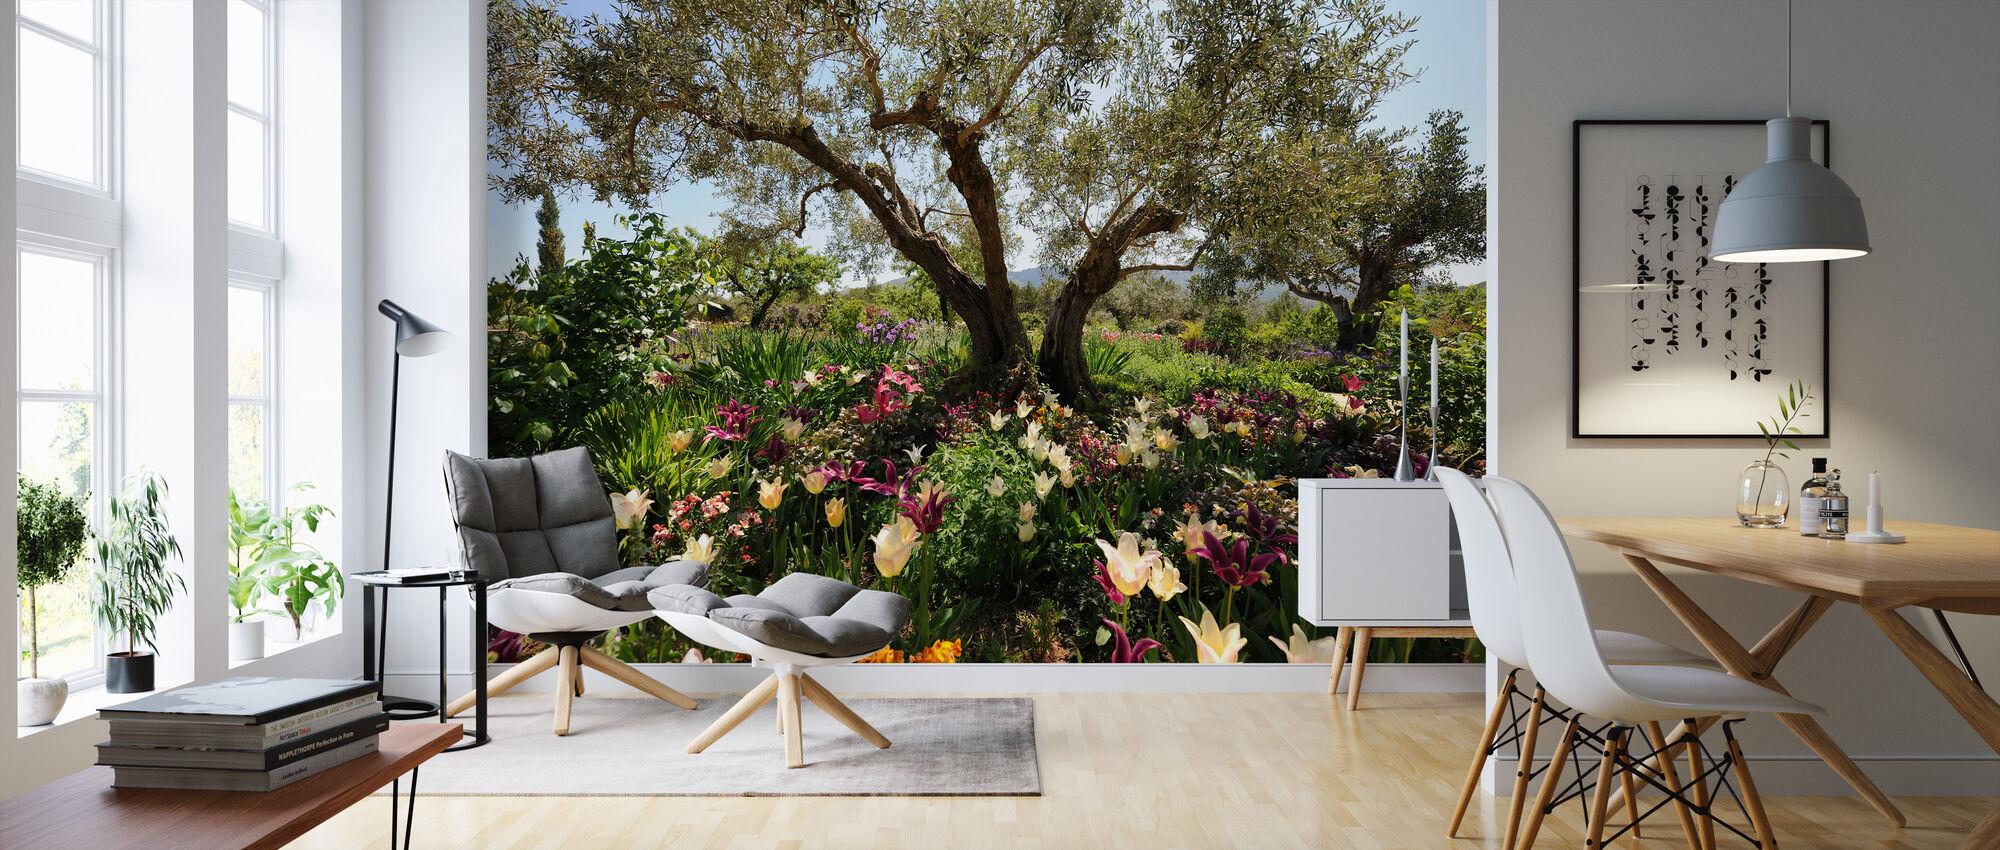 Beneath the Olive Tree - Wallpaper - Living Room